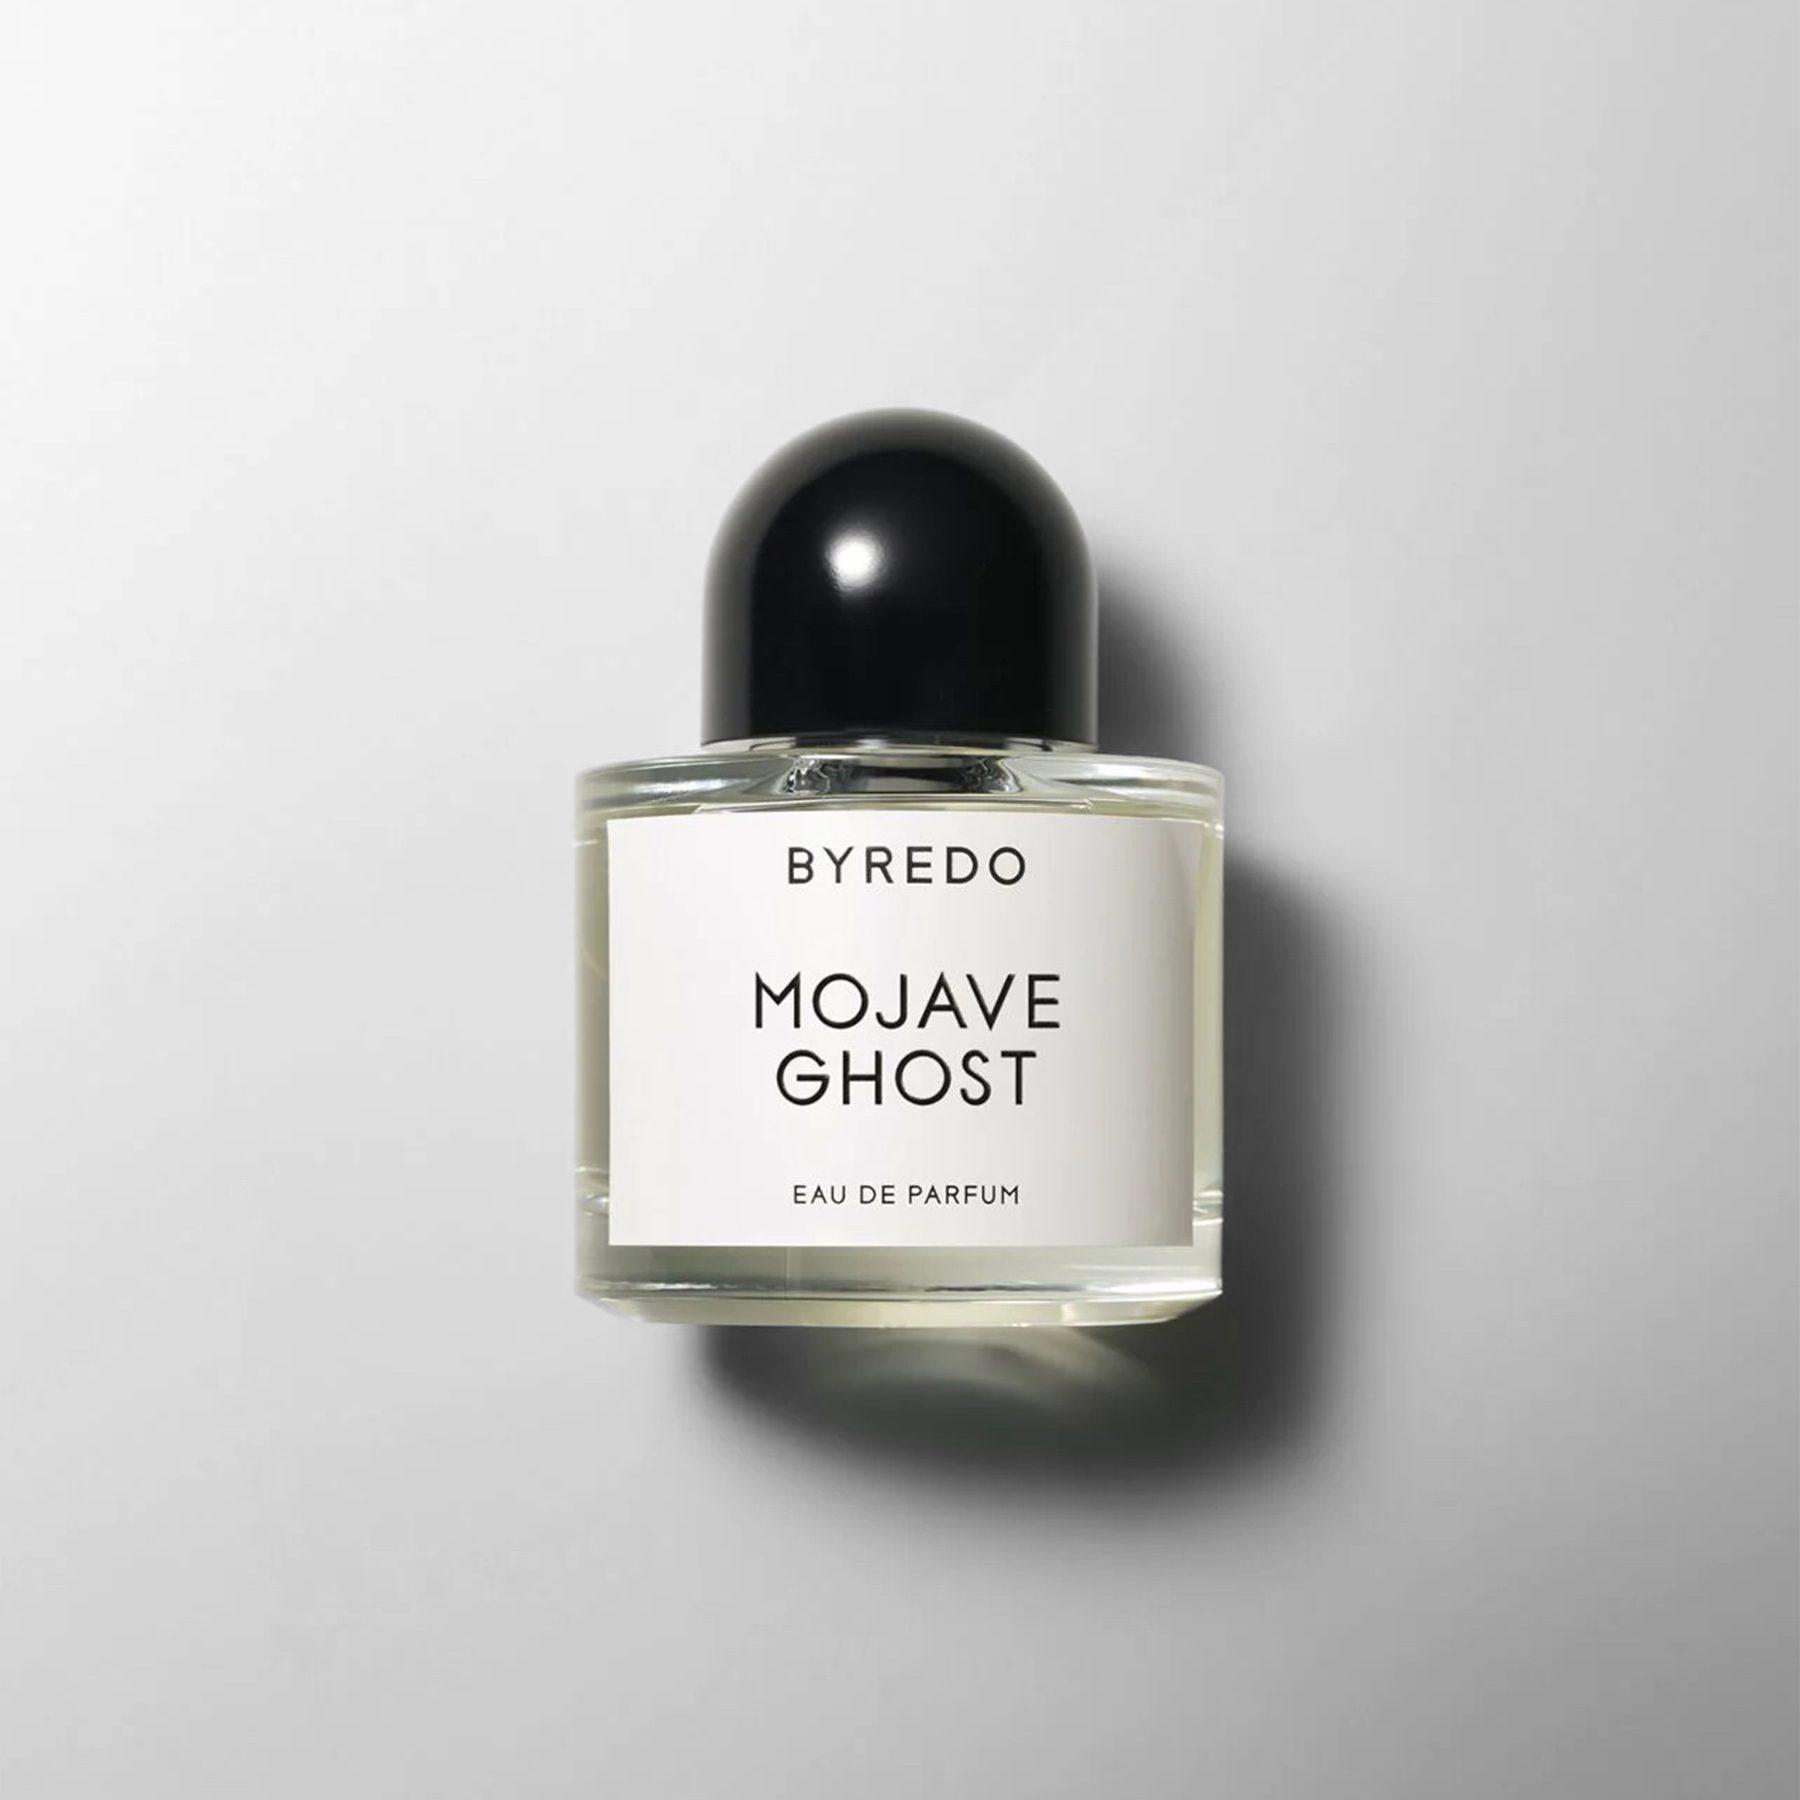 BYREDO Mojave Ghost